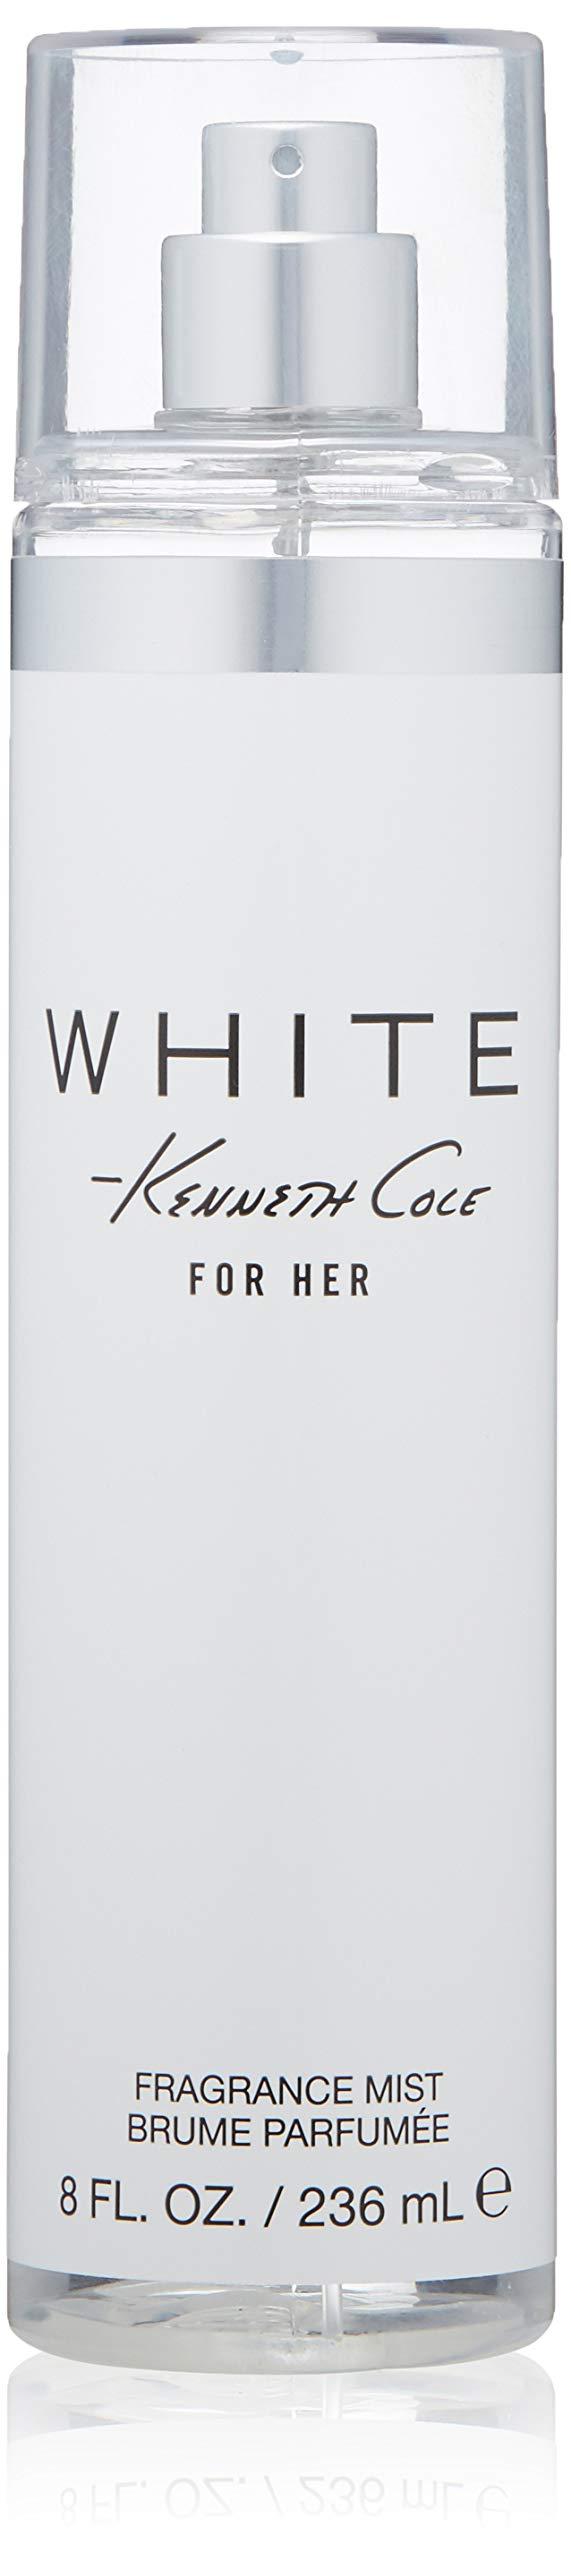 Kenneth Cole White for Her Body Mist, 8.0 Fl oz